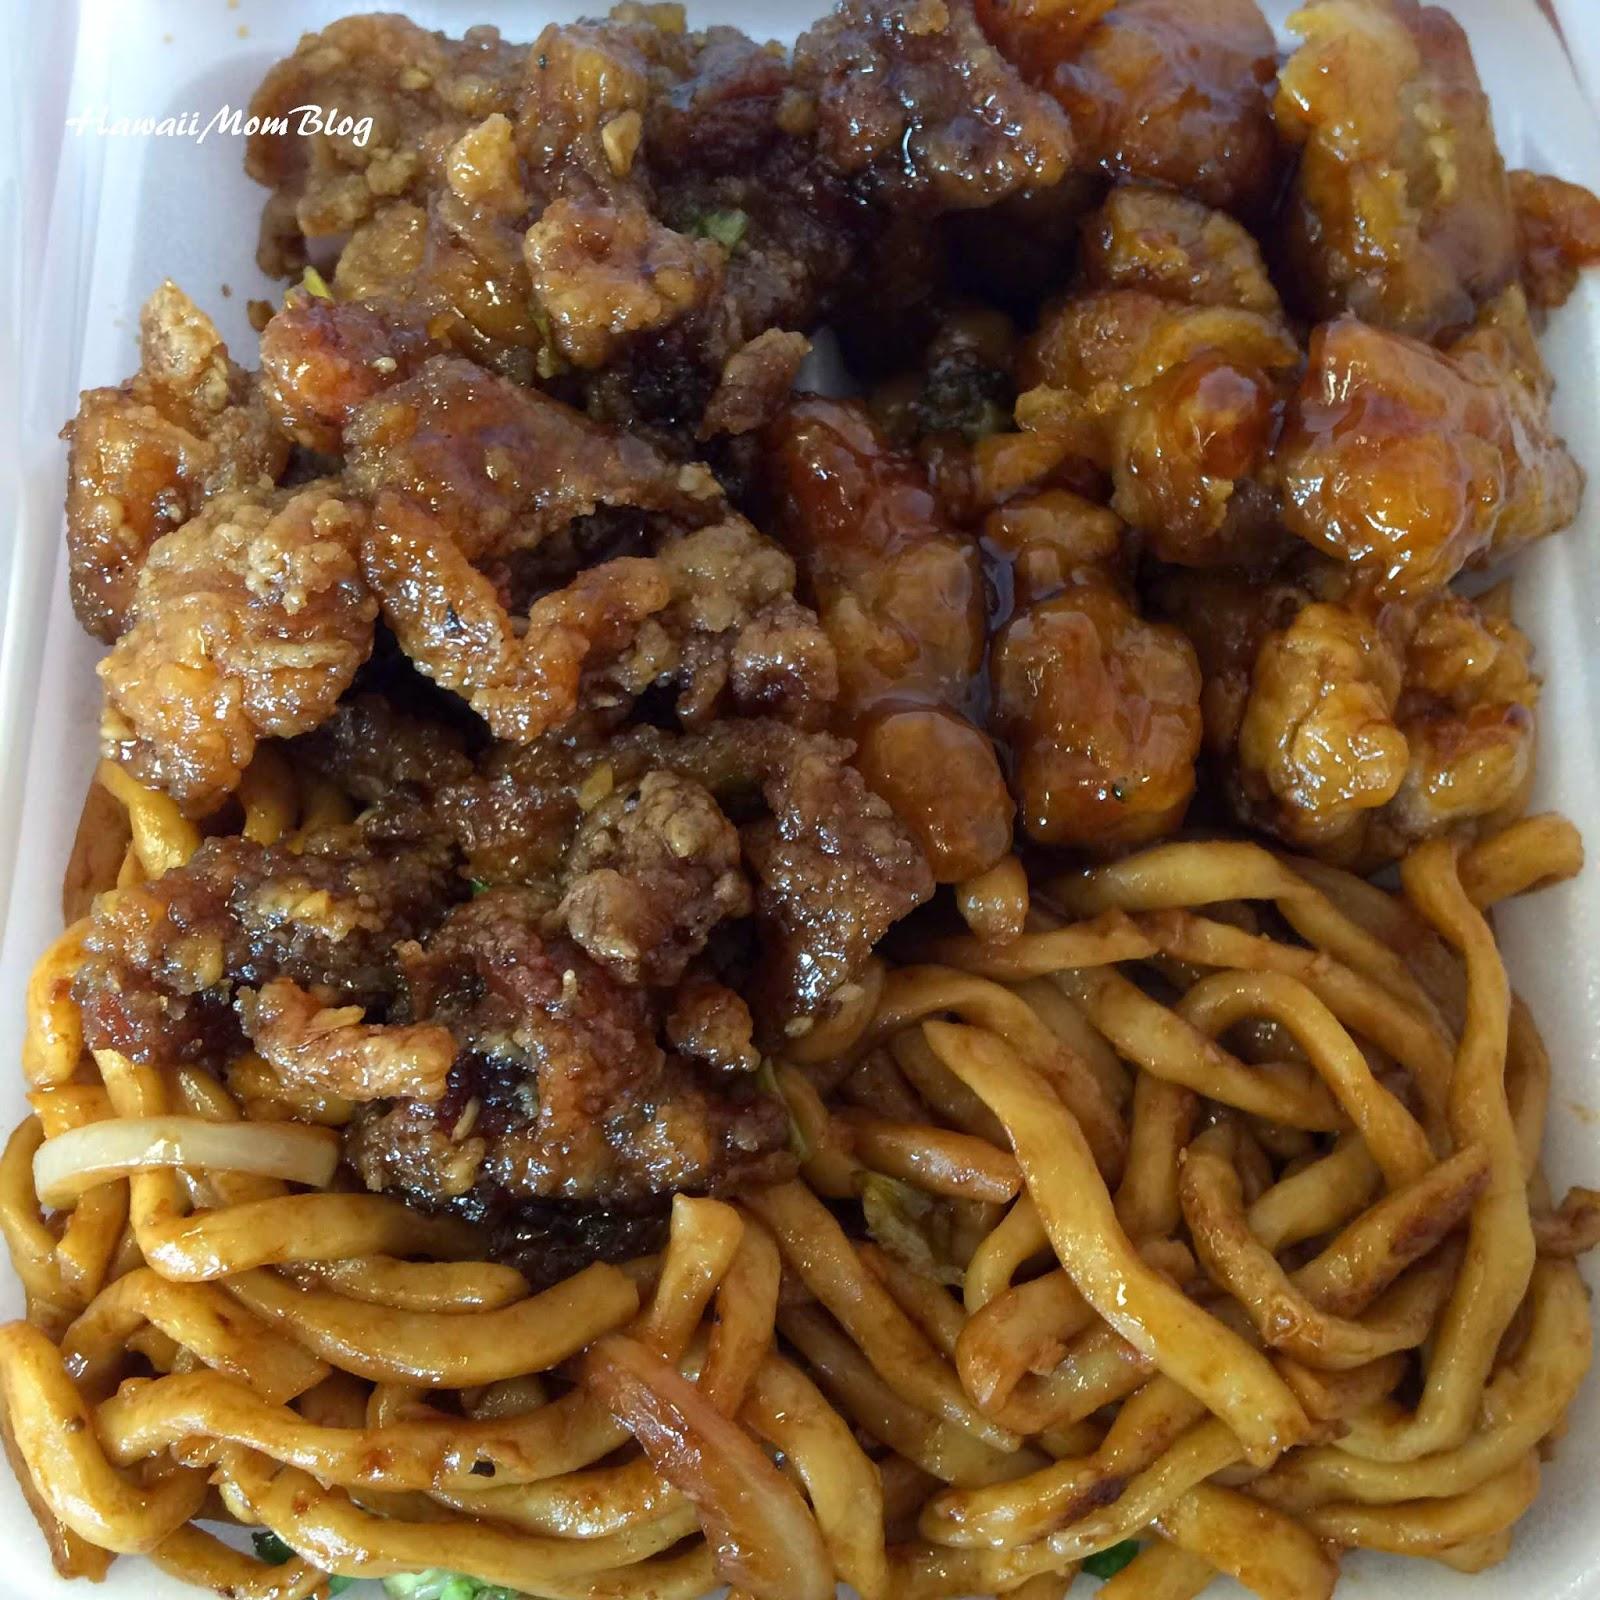 Hawaii Mom Blog: Deep Fried Manapuas & More At Honolulu